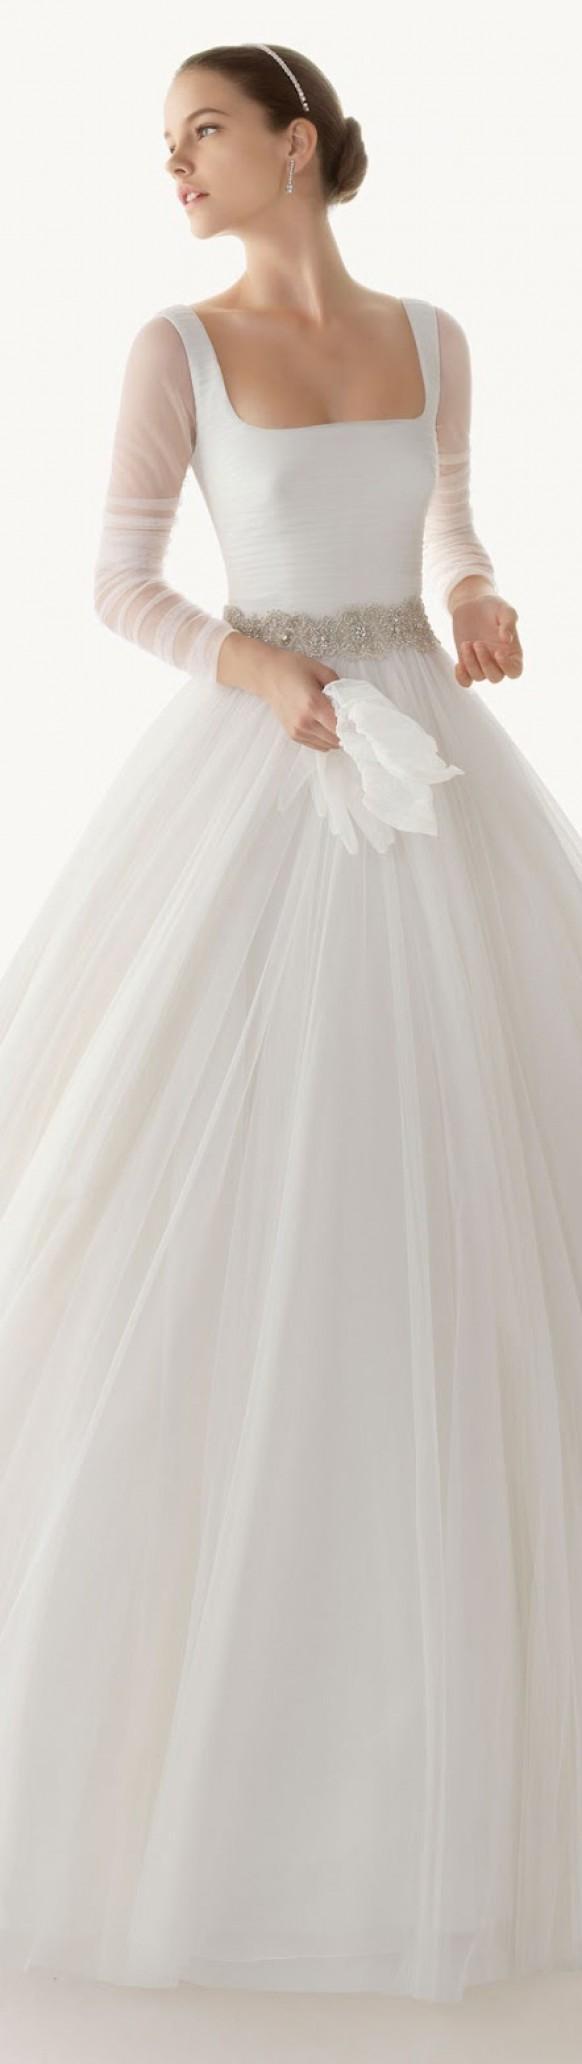 Wedding dresses wedding dress weddings and wedding